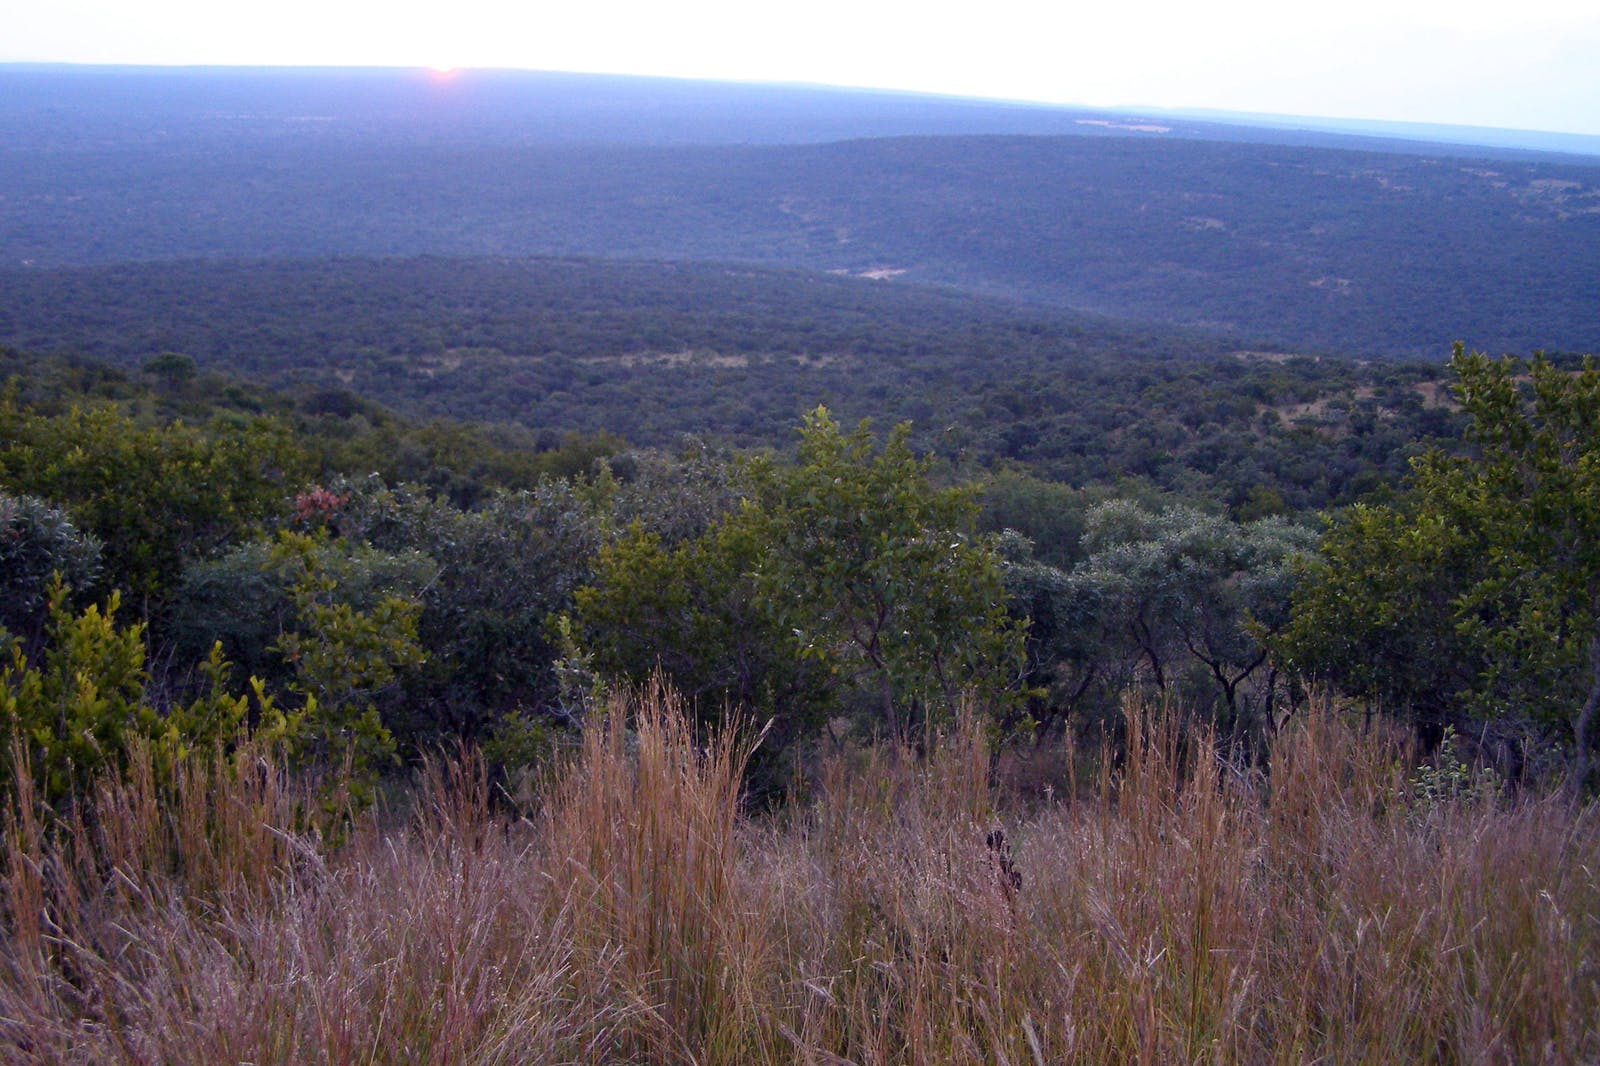 Central Bushveld